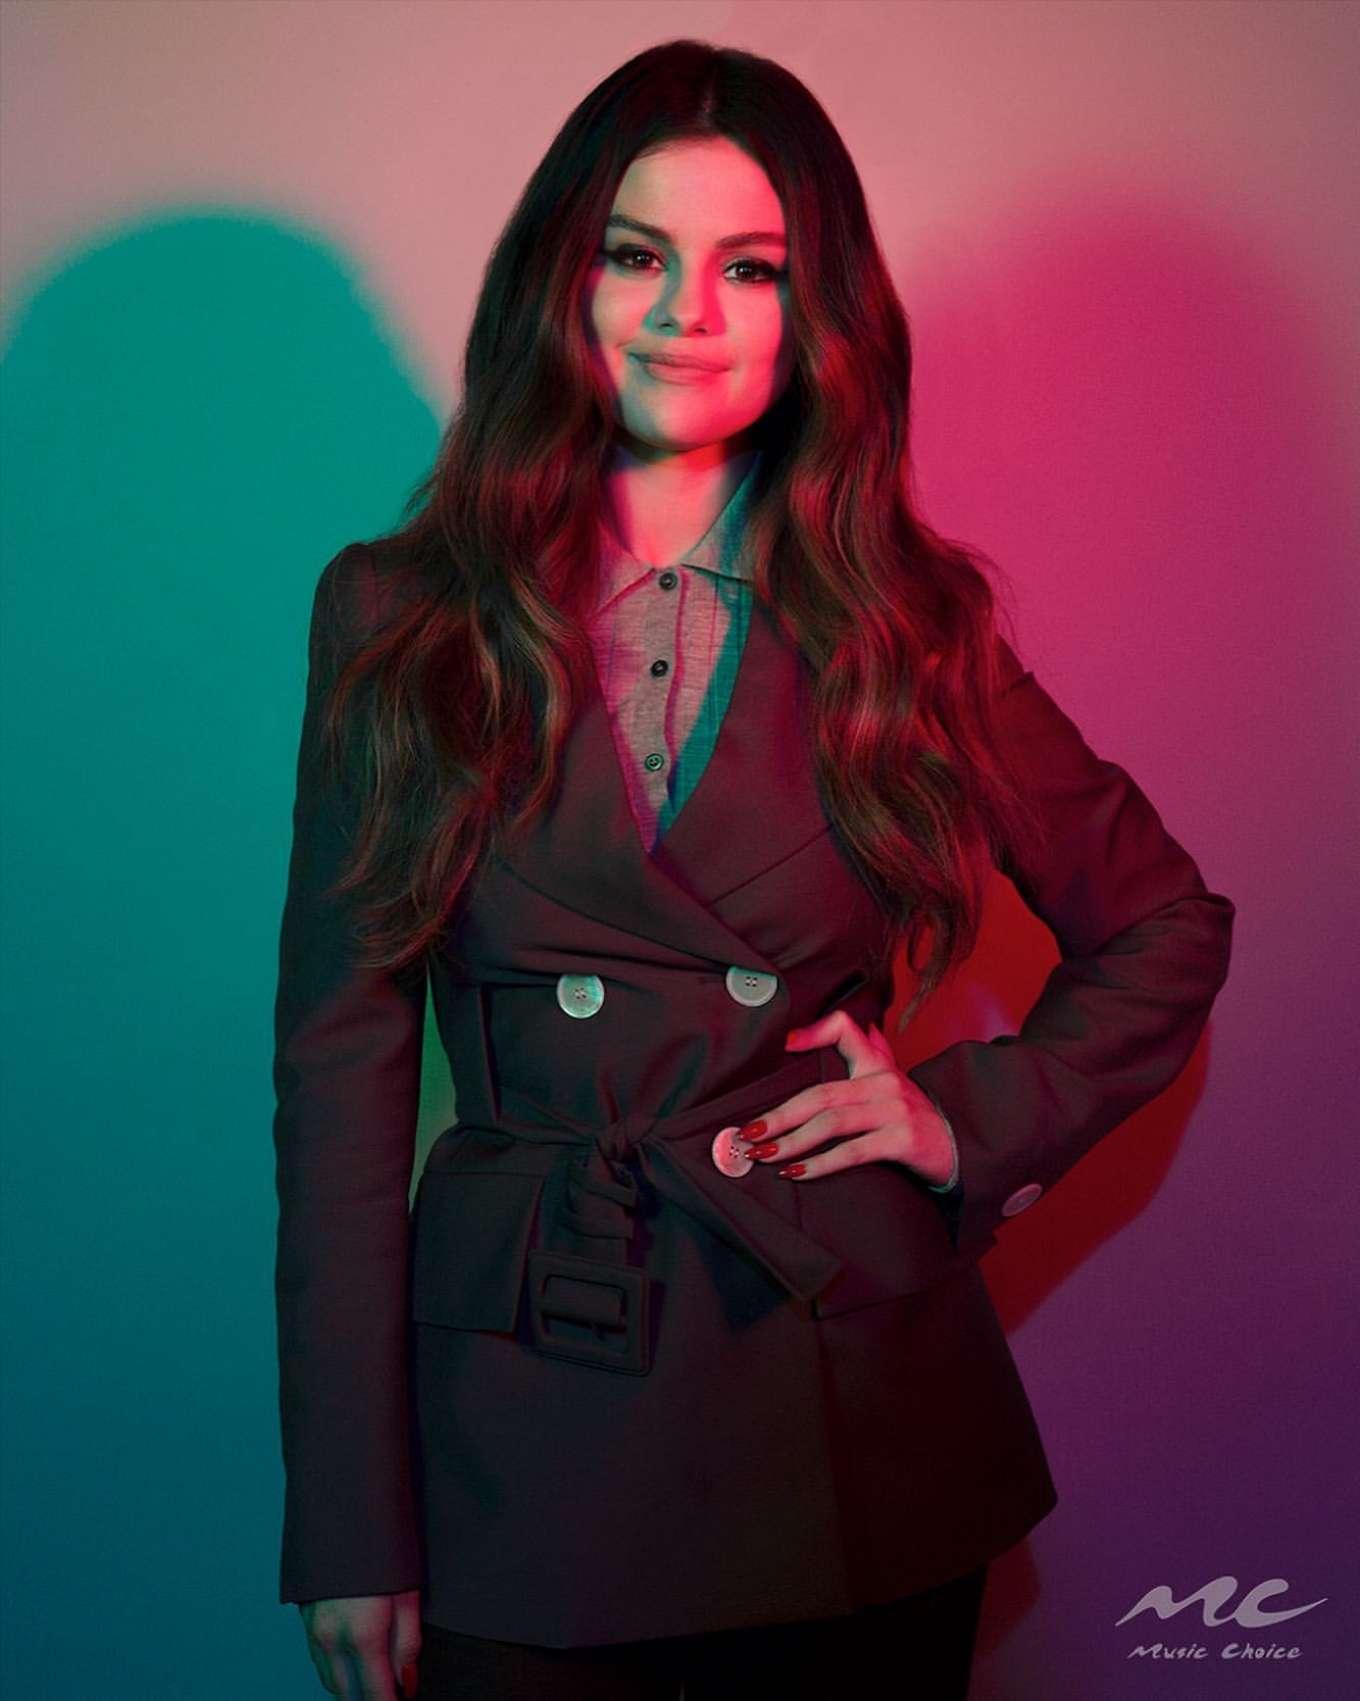 Selena Gomez - Music Choice Portrait (October 2019)